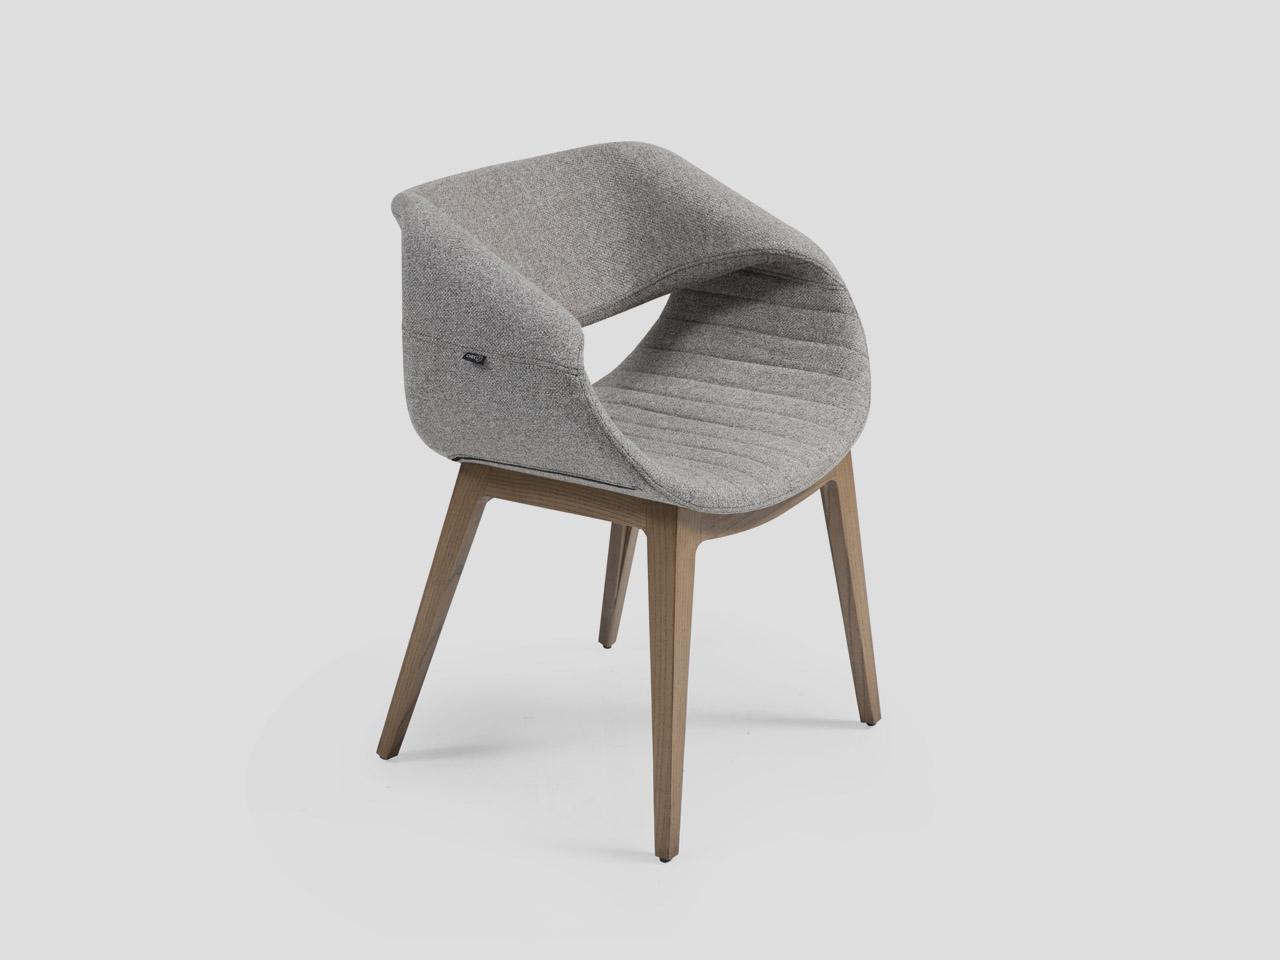 trpezarijska stolica stilo